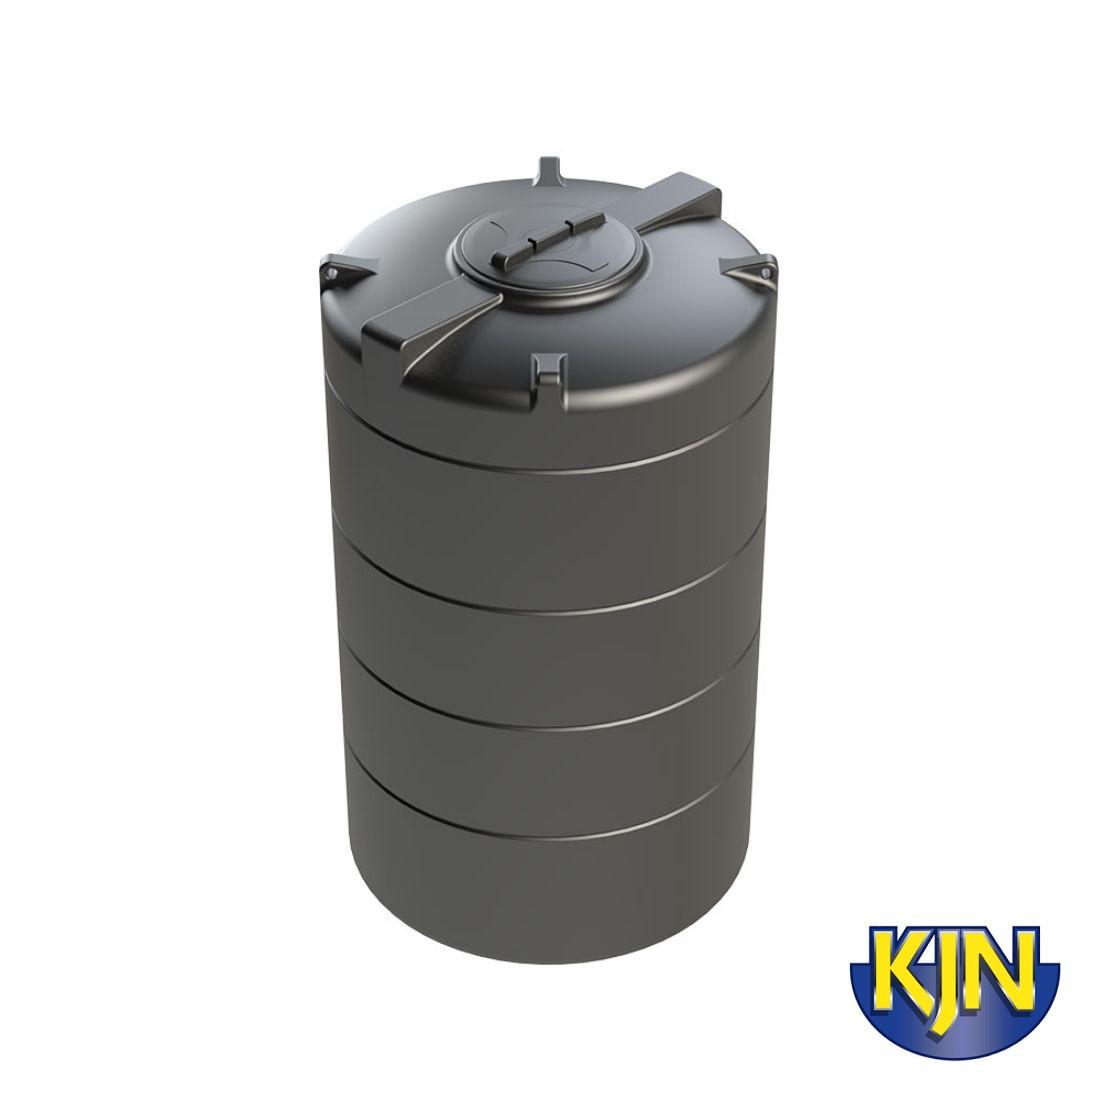 Enduramaxx 2,000 Litre Vertical Non-Potable Water Storage Tank